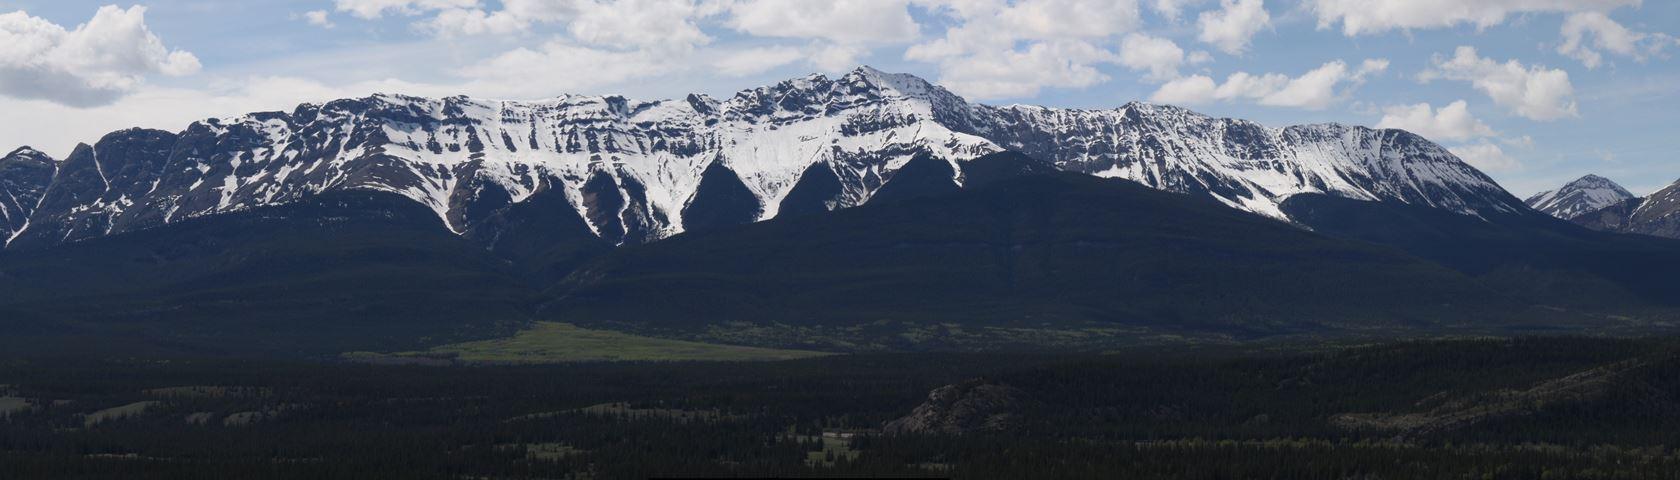 Panoramic Mountain Range